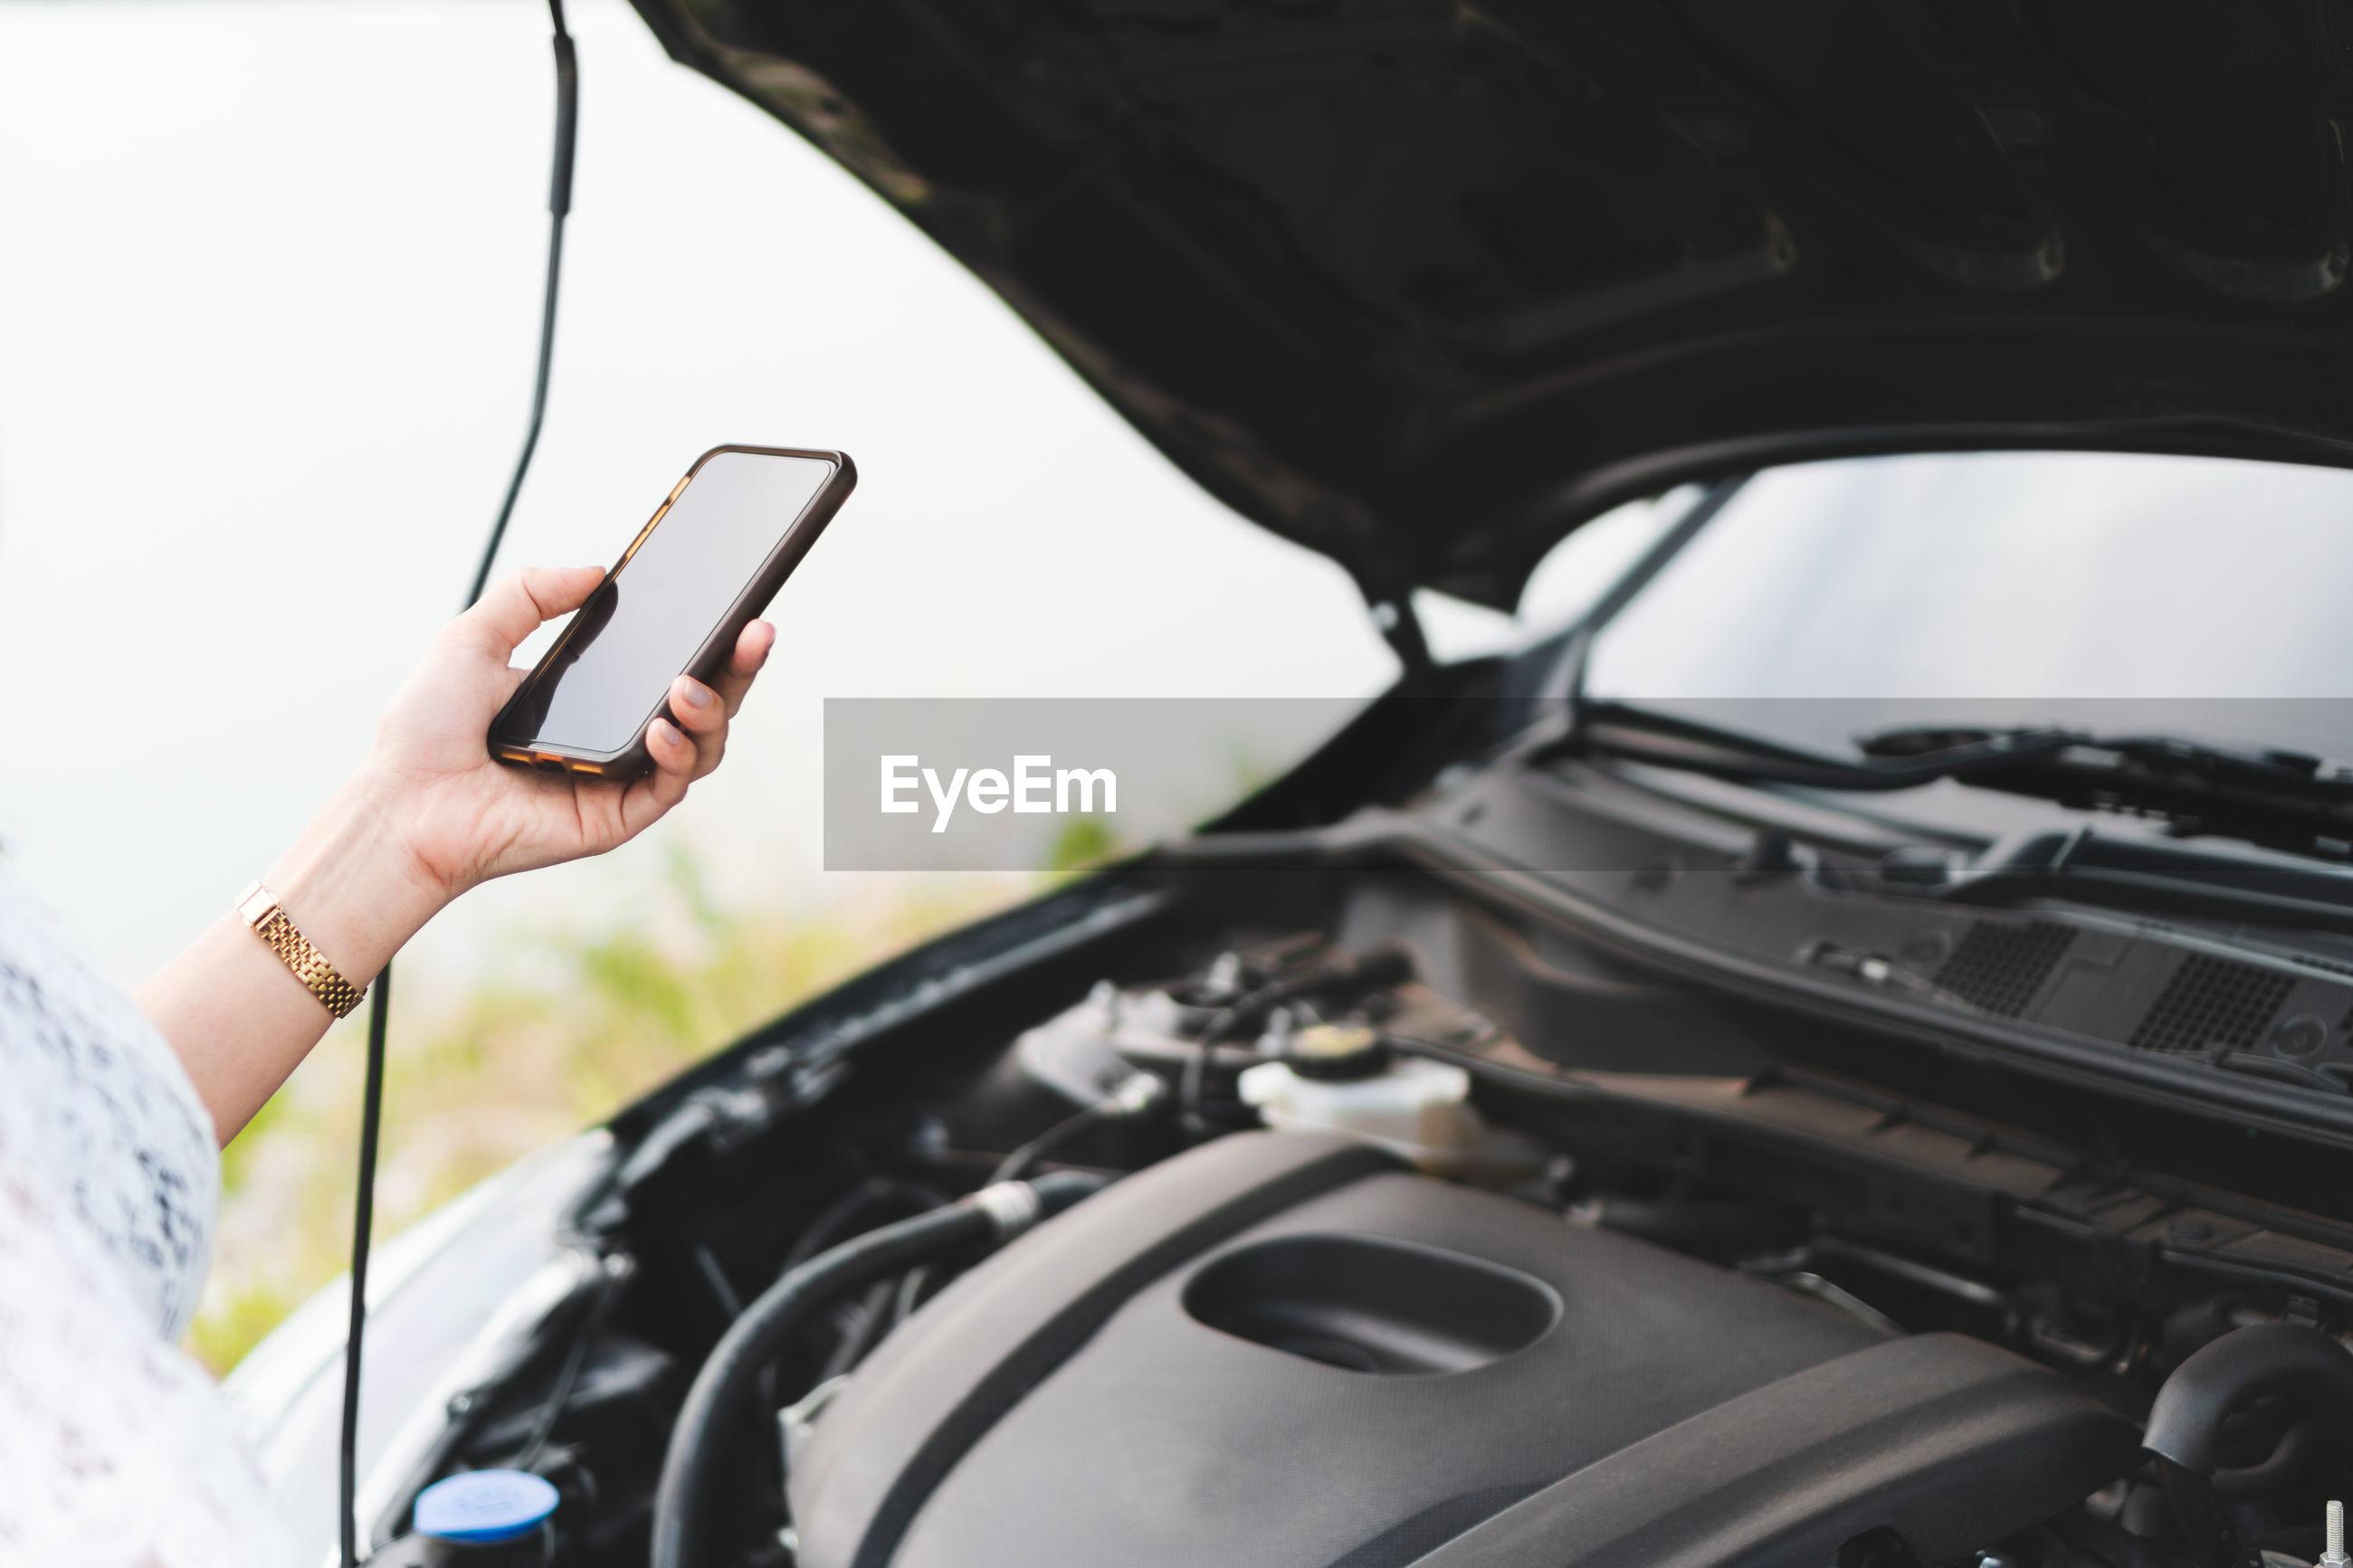 Woman using mobile phone while repairing car outdoors